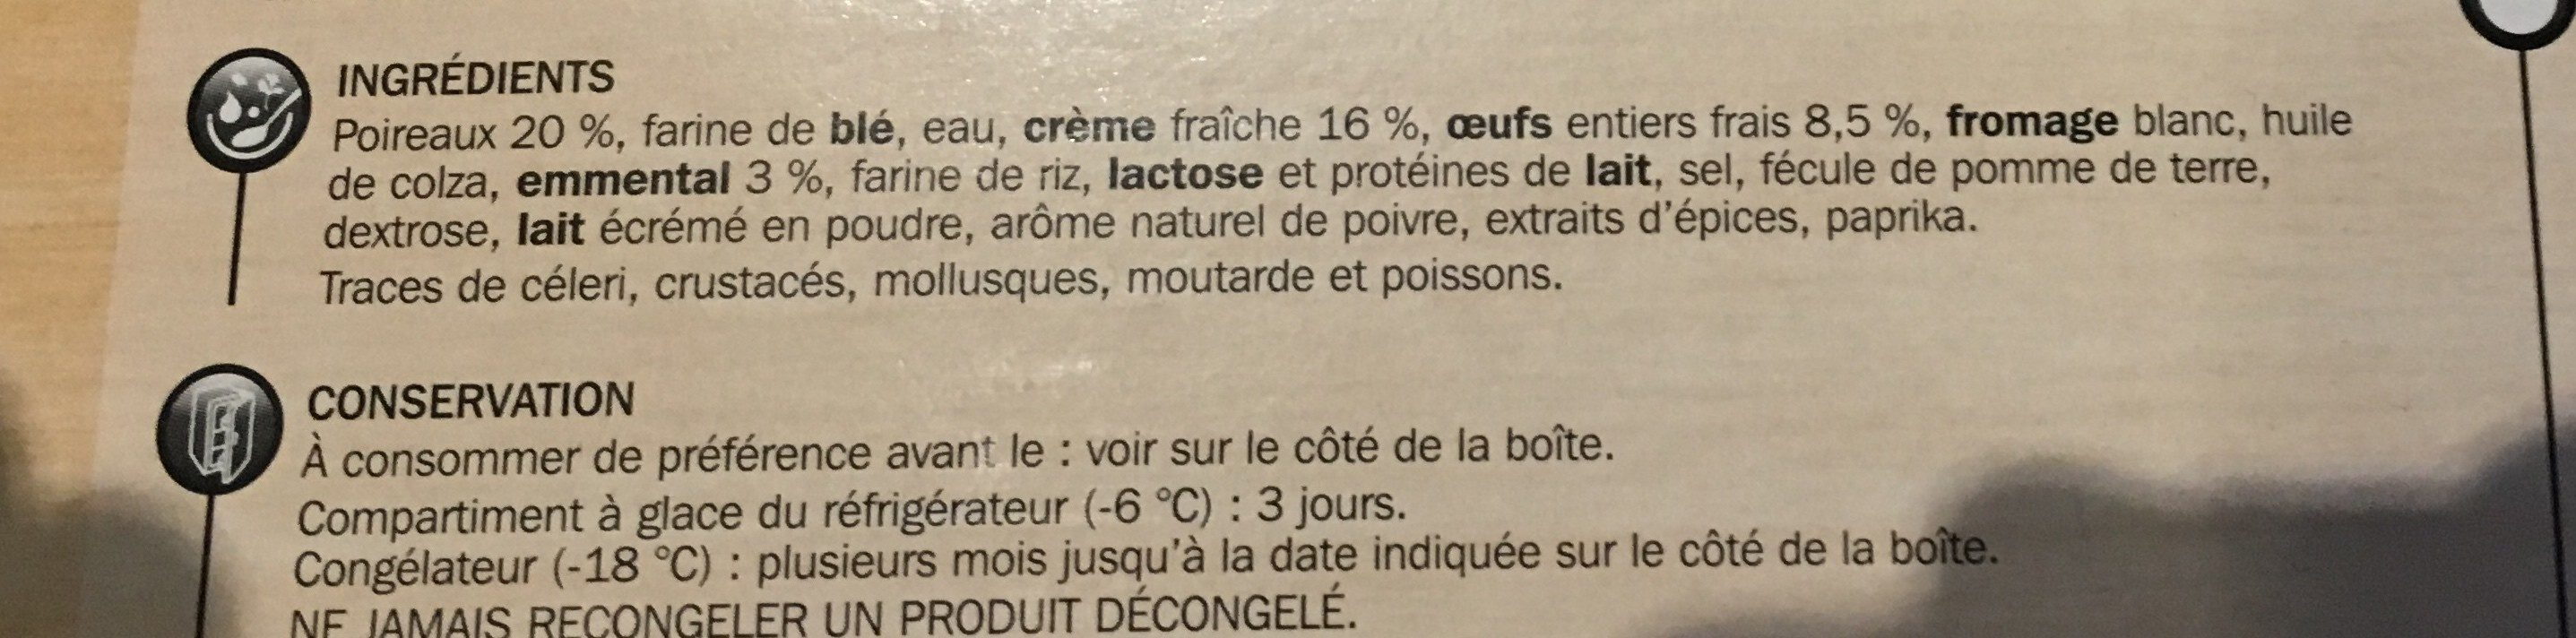 Tarte aux poireaux - Składniki